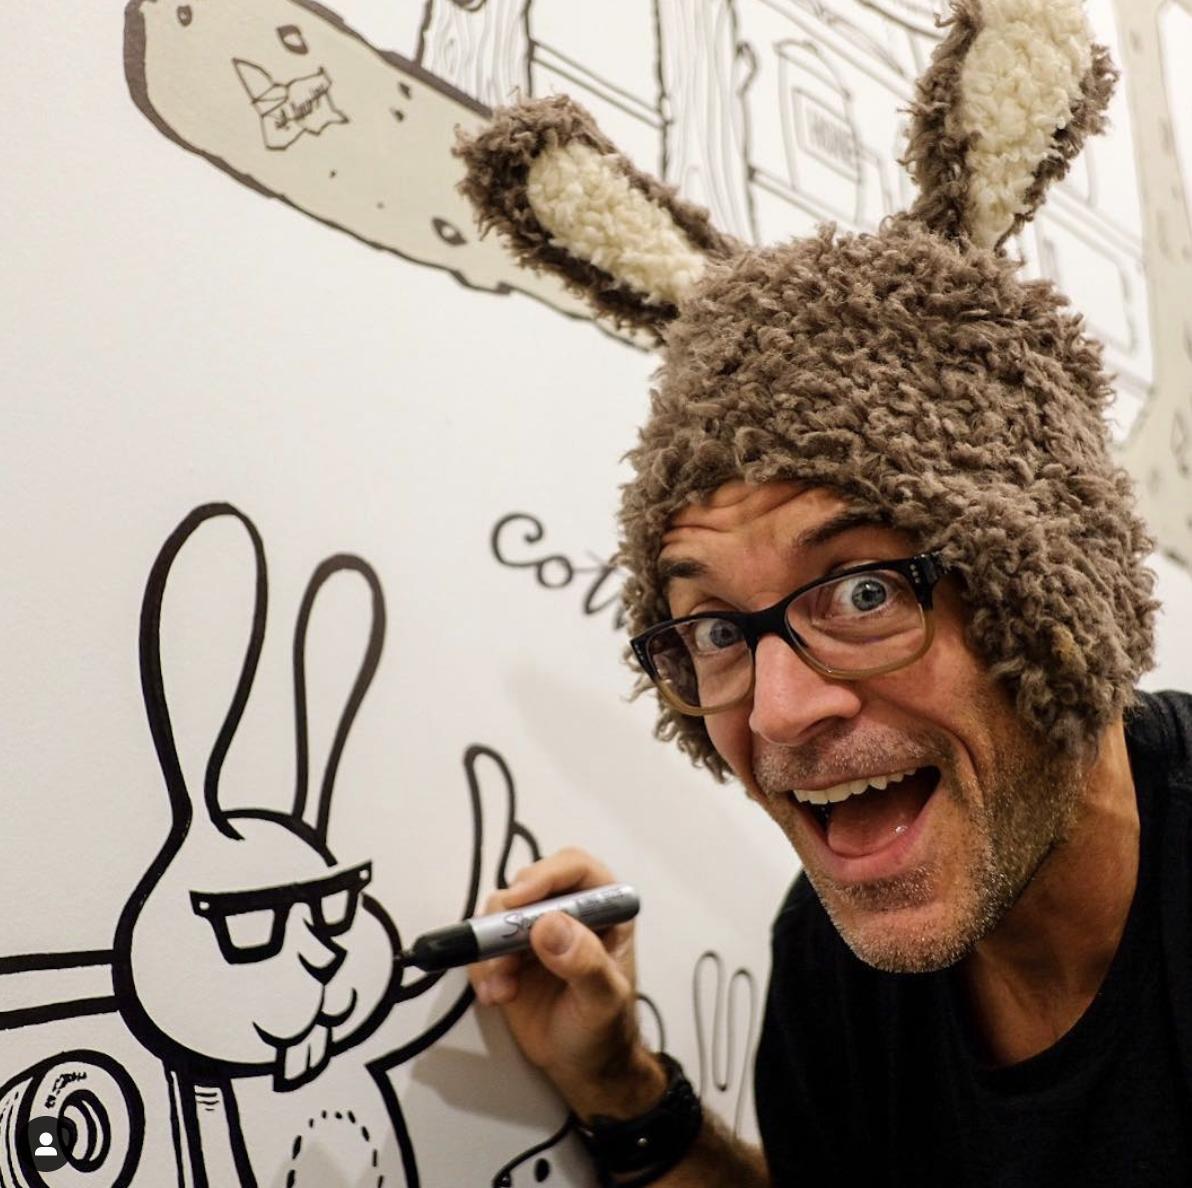 dylan menges rabbit project